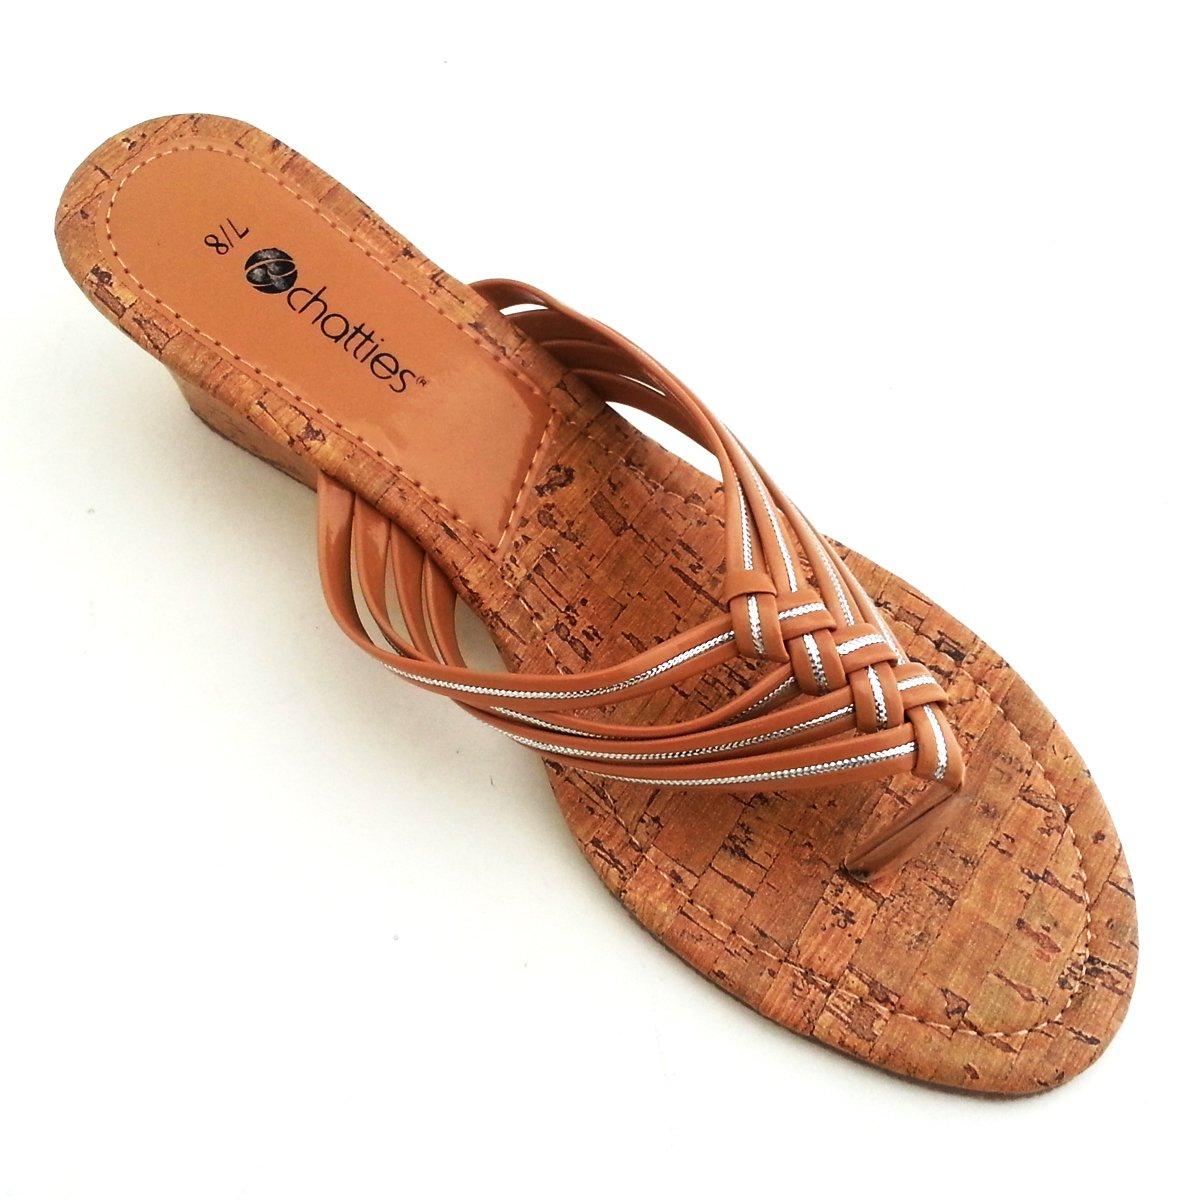 Chatties Women's Braided Cork Mini Wedge Spa Sandals Schonfeld